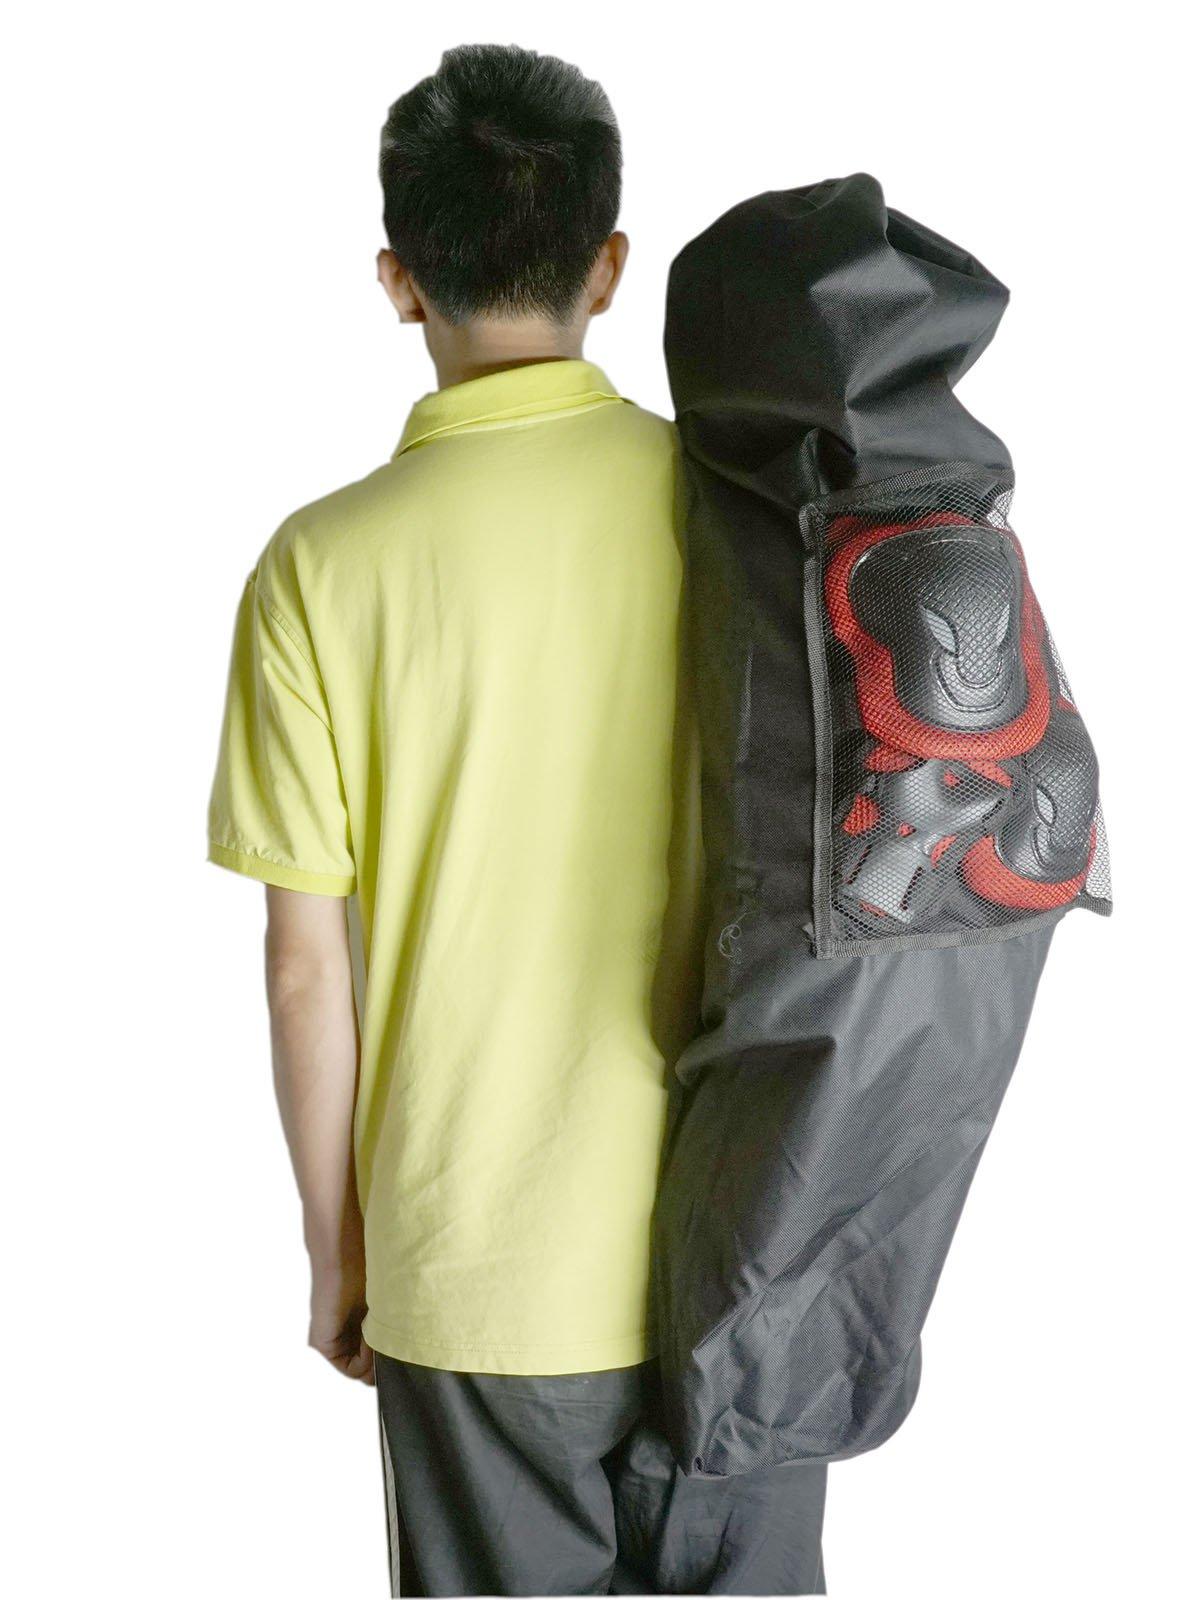 Cooplay Professional 41 inch Longboard Skateboard Carry Bag Big Handy Backpack Handbag Rollerboard Long Board Ourdoor Sport 95cm - 105cm with Big Mesh by Cooplay